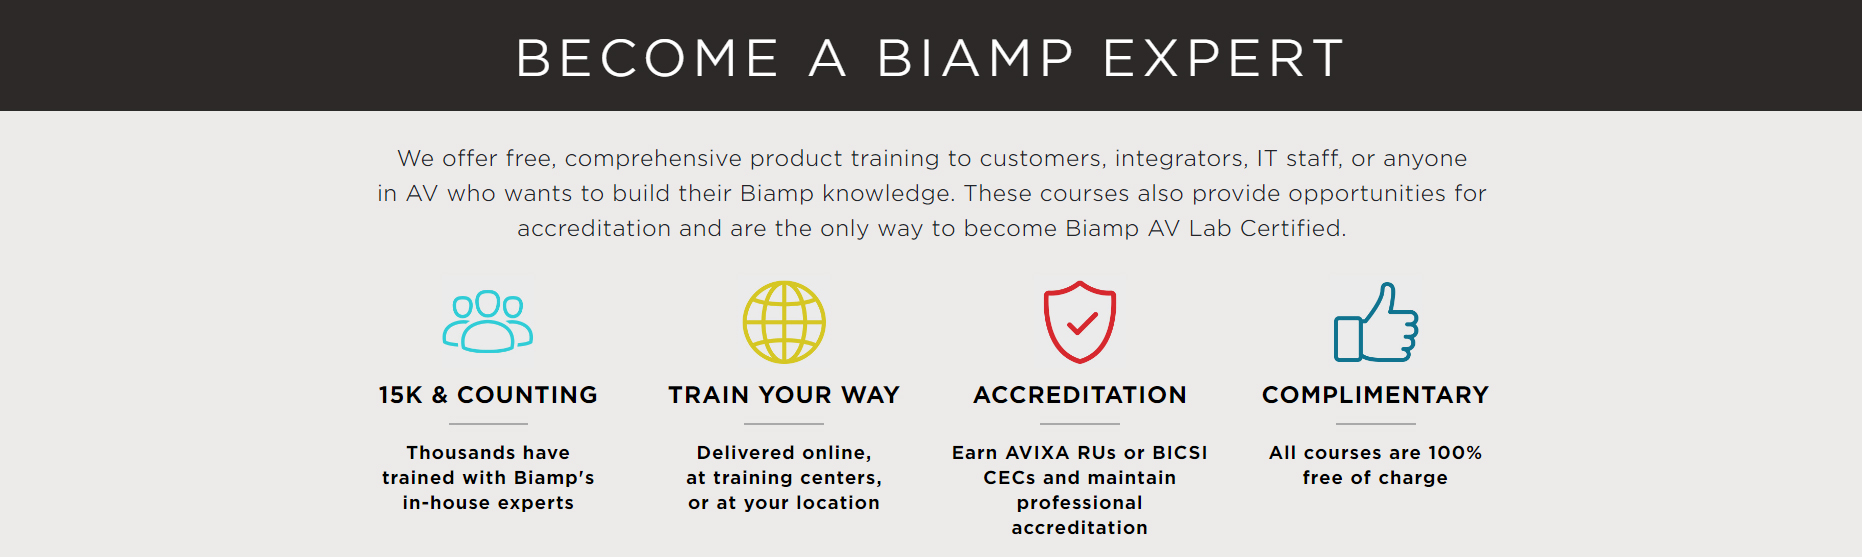 biamp-training-offerings-banner